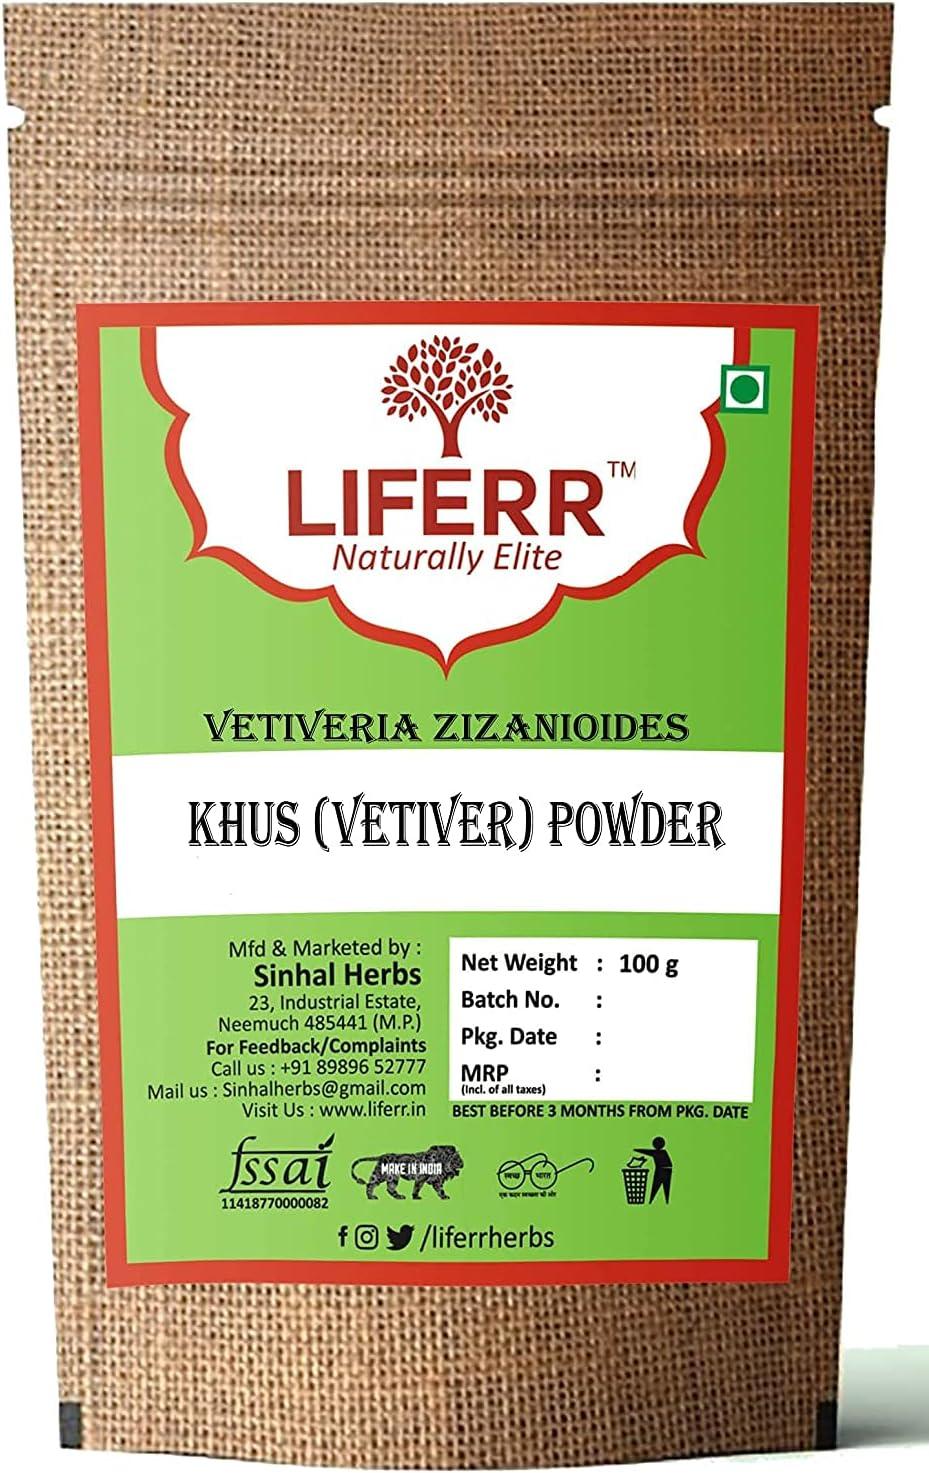 Panihari LIFERR Vetiver Powder High order Vetiveria Zi Chicago Mall Khus Root